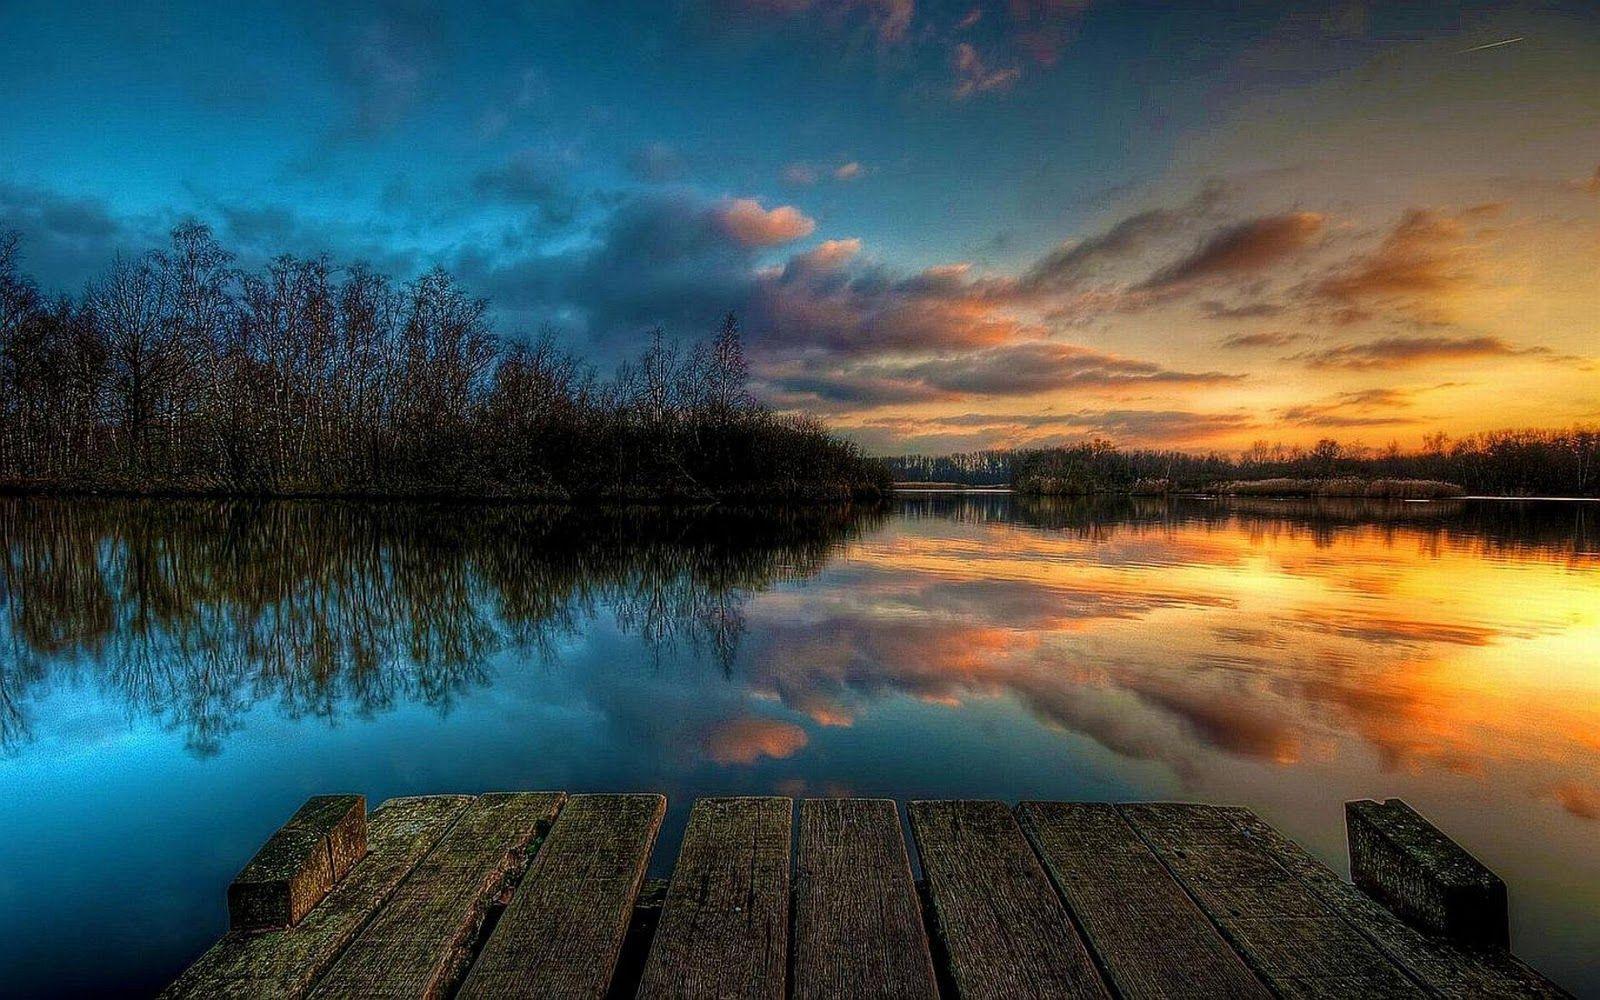 Sunset On The River Hd Desktop Wallpaper Cool Backgrounds Cool Backgrounds Hd Sunset Wallpaper